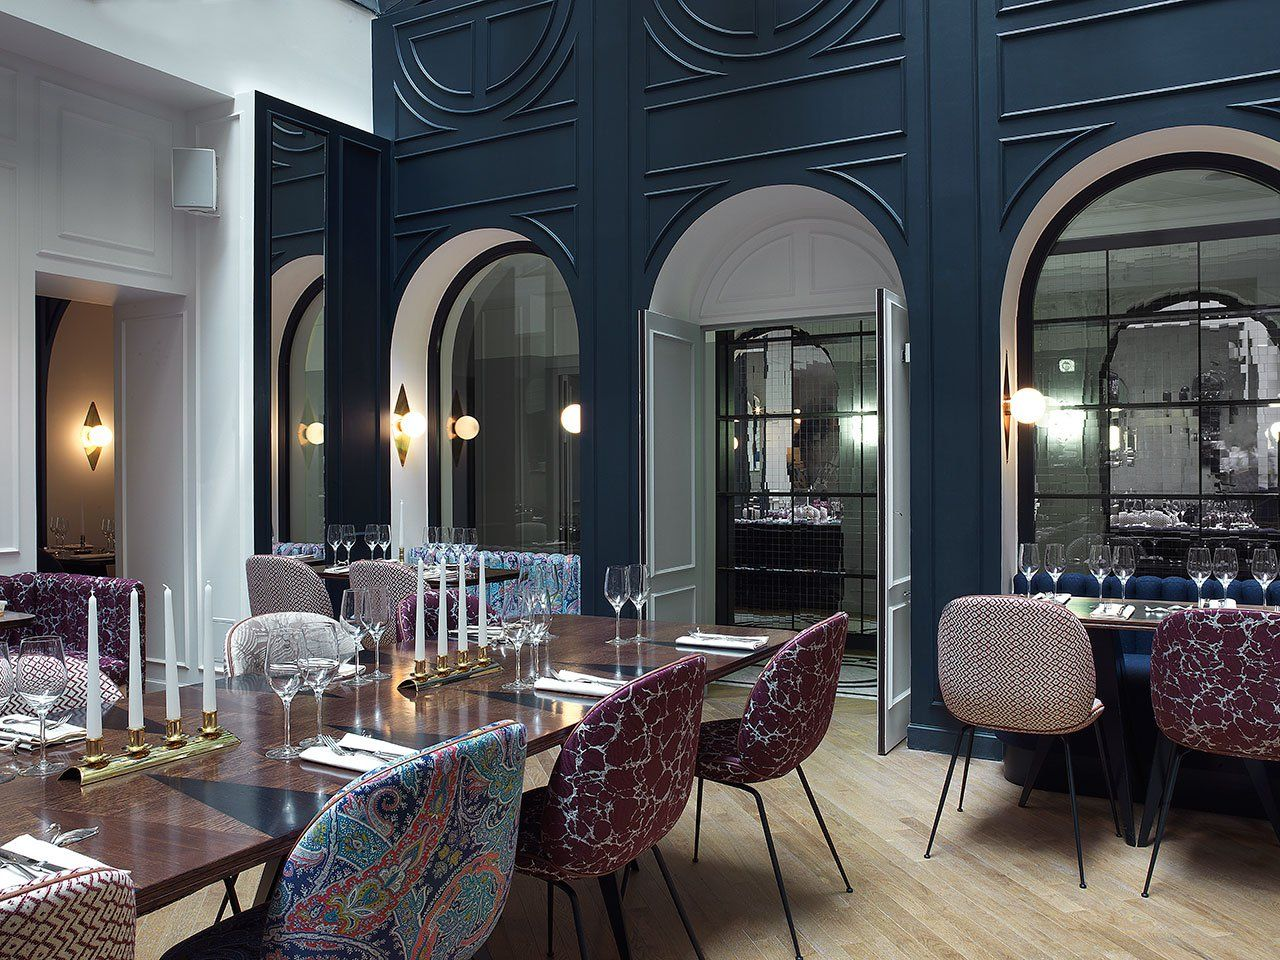 Art deco thrills at hotel bachaumont paris cafes restaurants